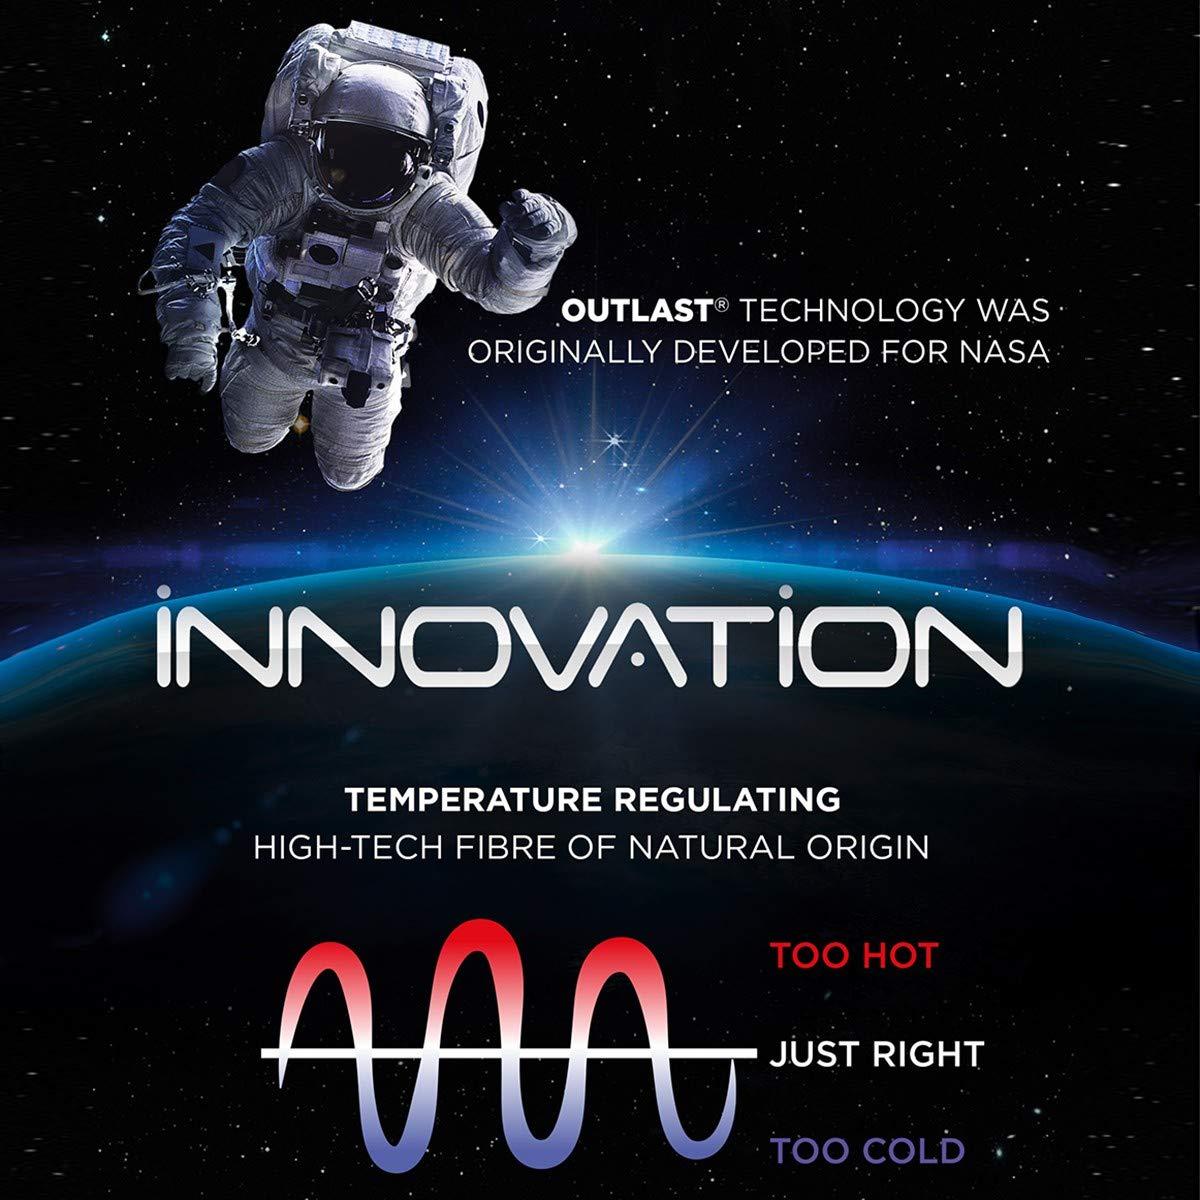 IMPETUS Innovation Thermoregulator Tank Top for Men